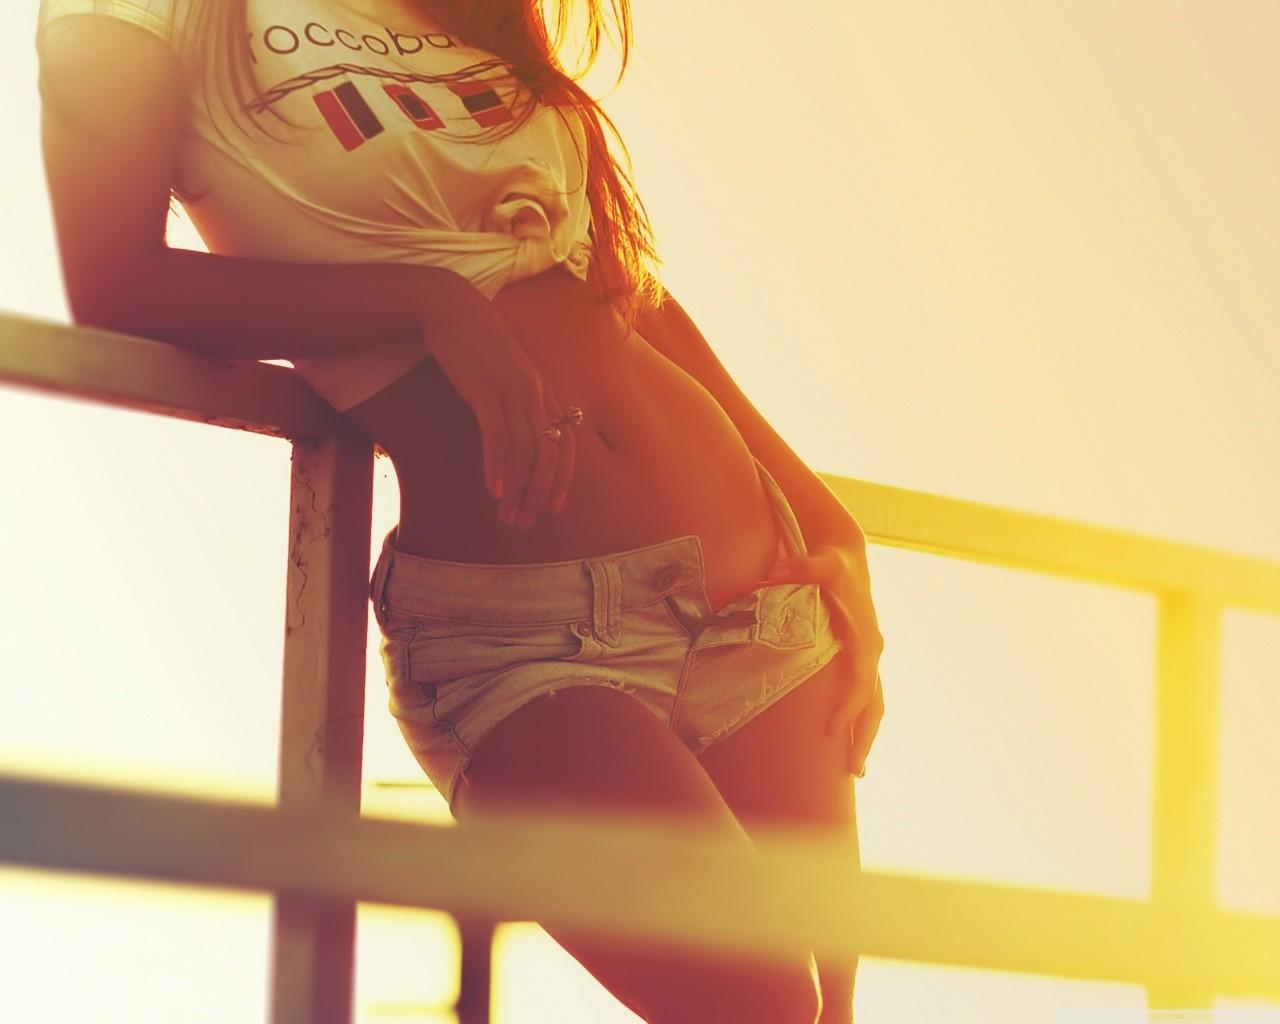 Гифки девушка снимает мини шорты фото